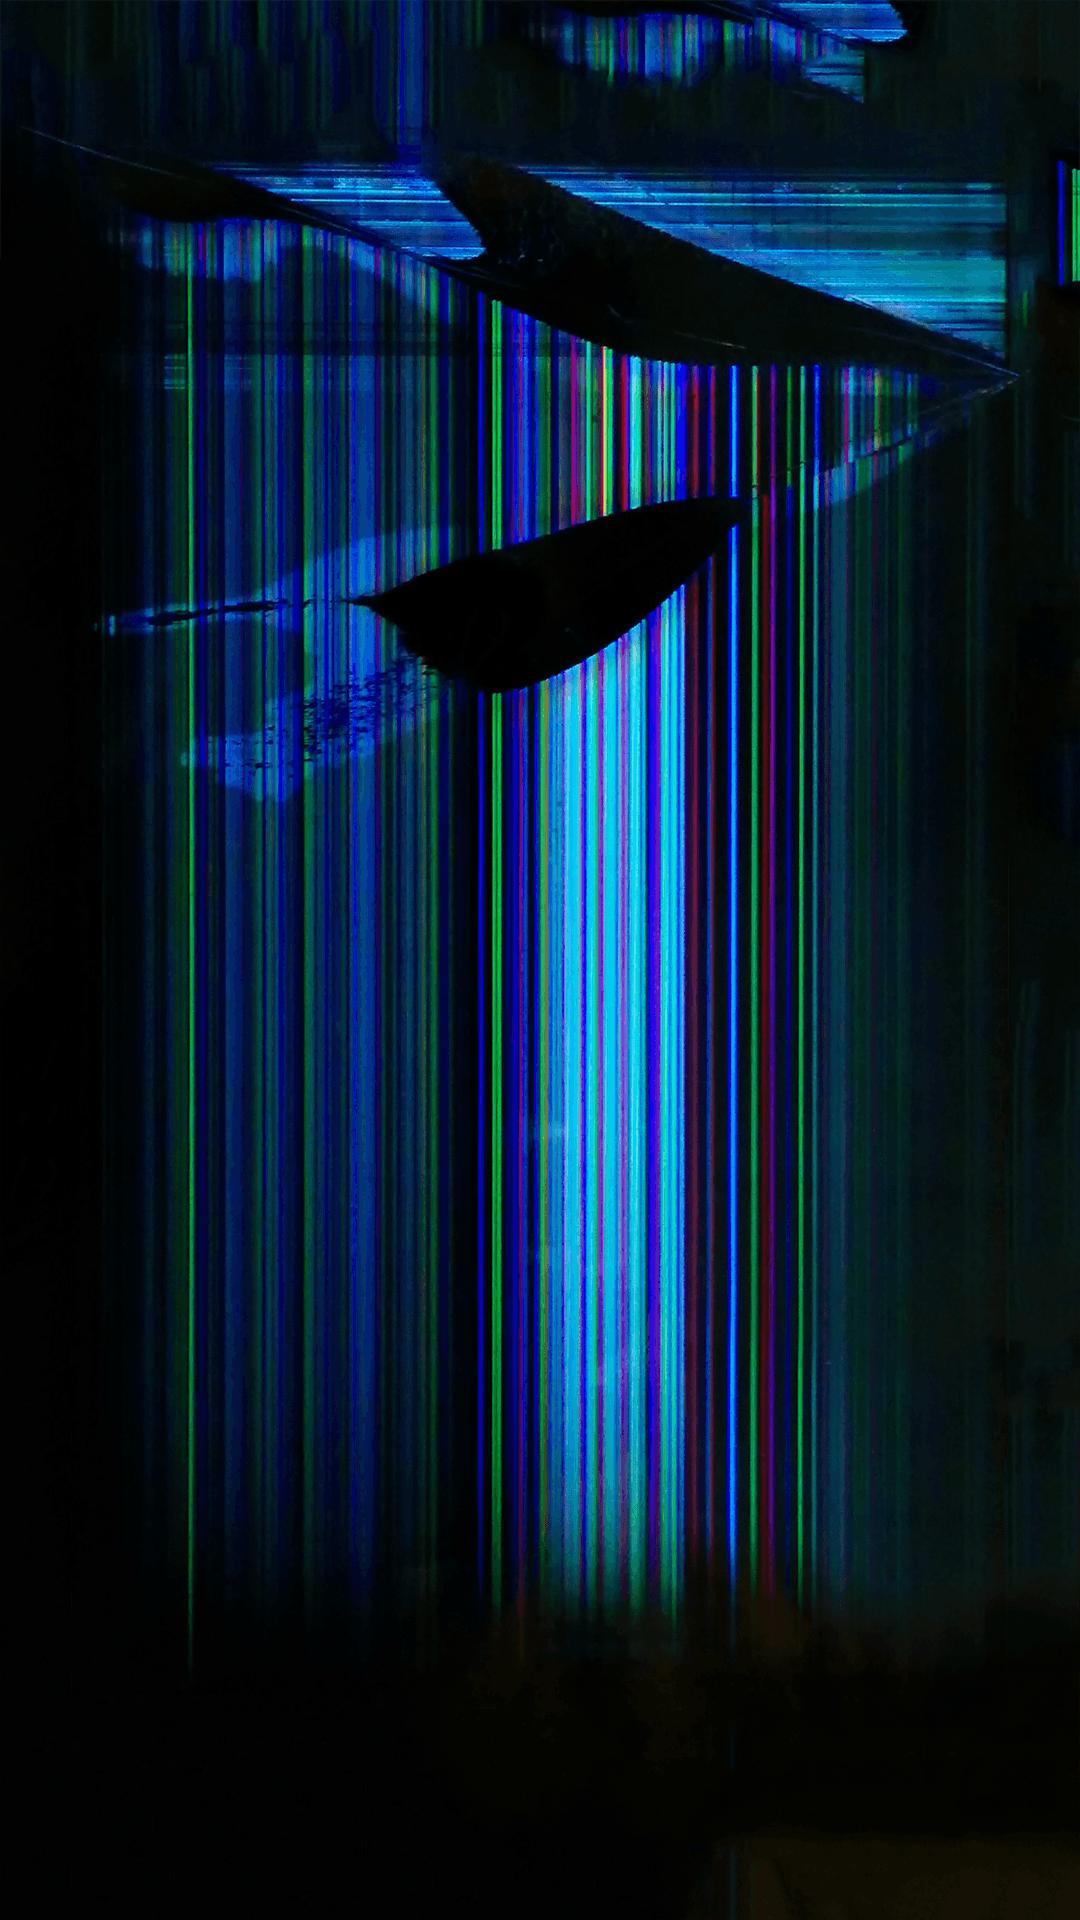 56 Wallpaper Cracked Screen On Wallpapersafari